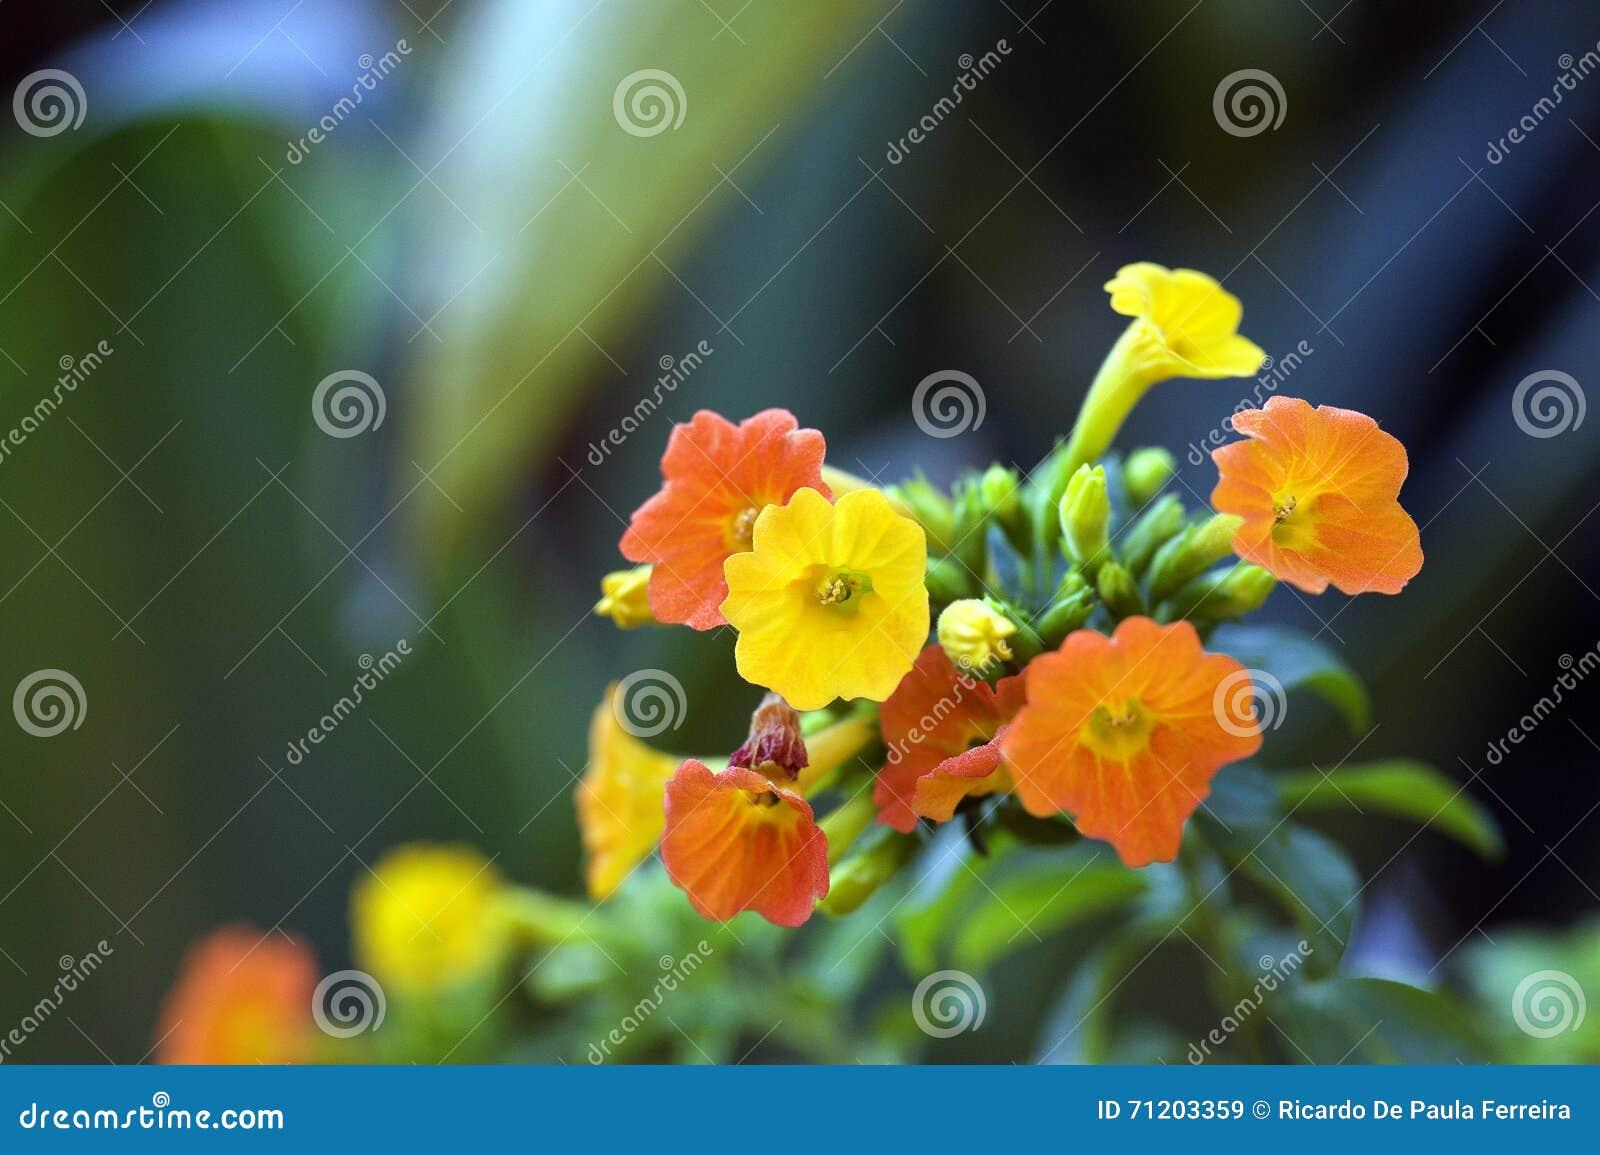 Orange And Yellow Flowers Of Marmalade Bush Stock Image Image Of